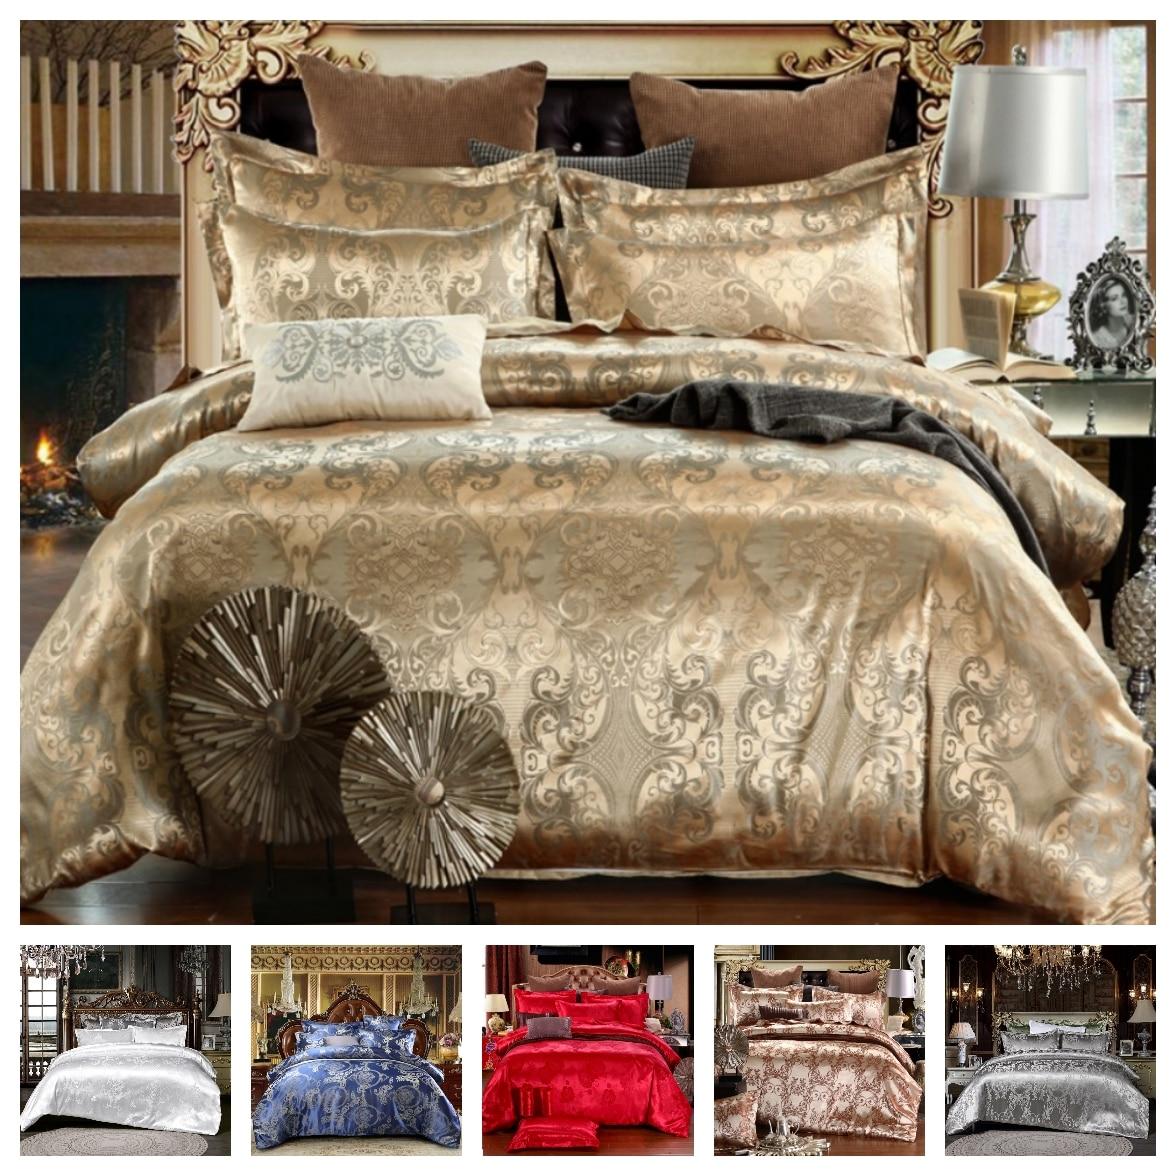 Luxury 2/3pcs Bedding Set Satin Jacquard Duvet Cover Sets 1 Quilt Cover + 1/2 Pillowcases US/EU Size Single Twin Full Queen King